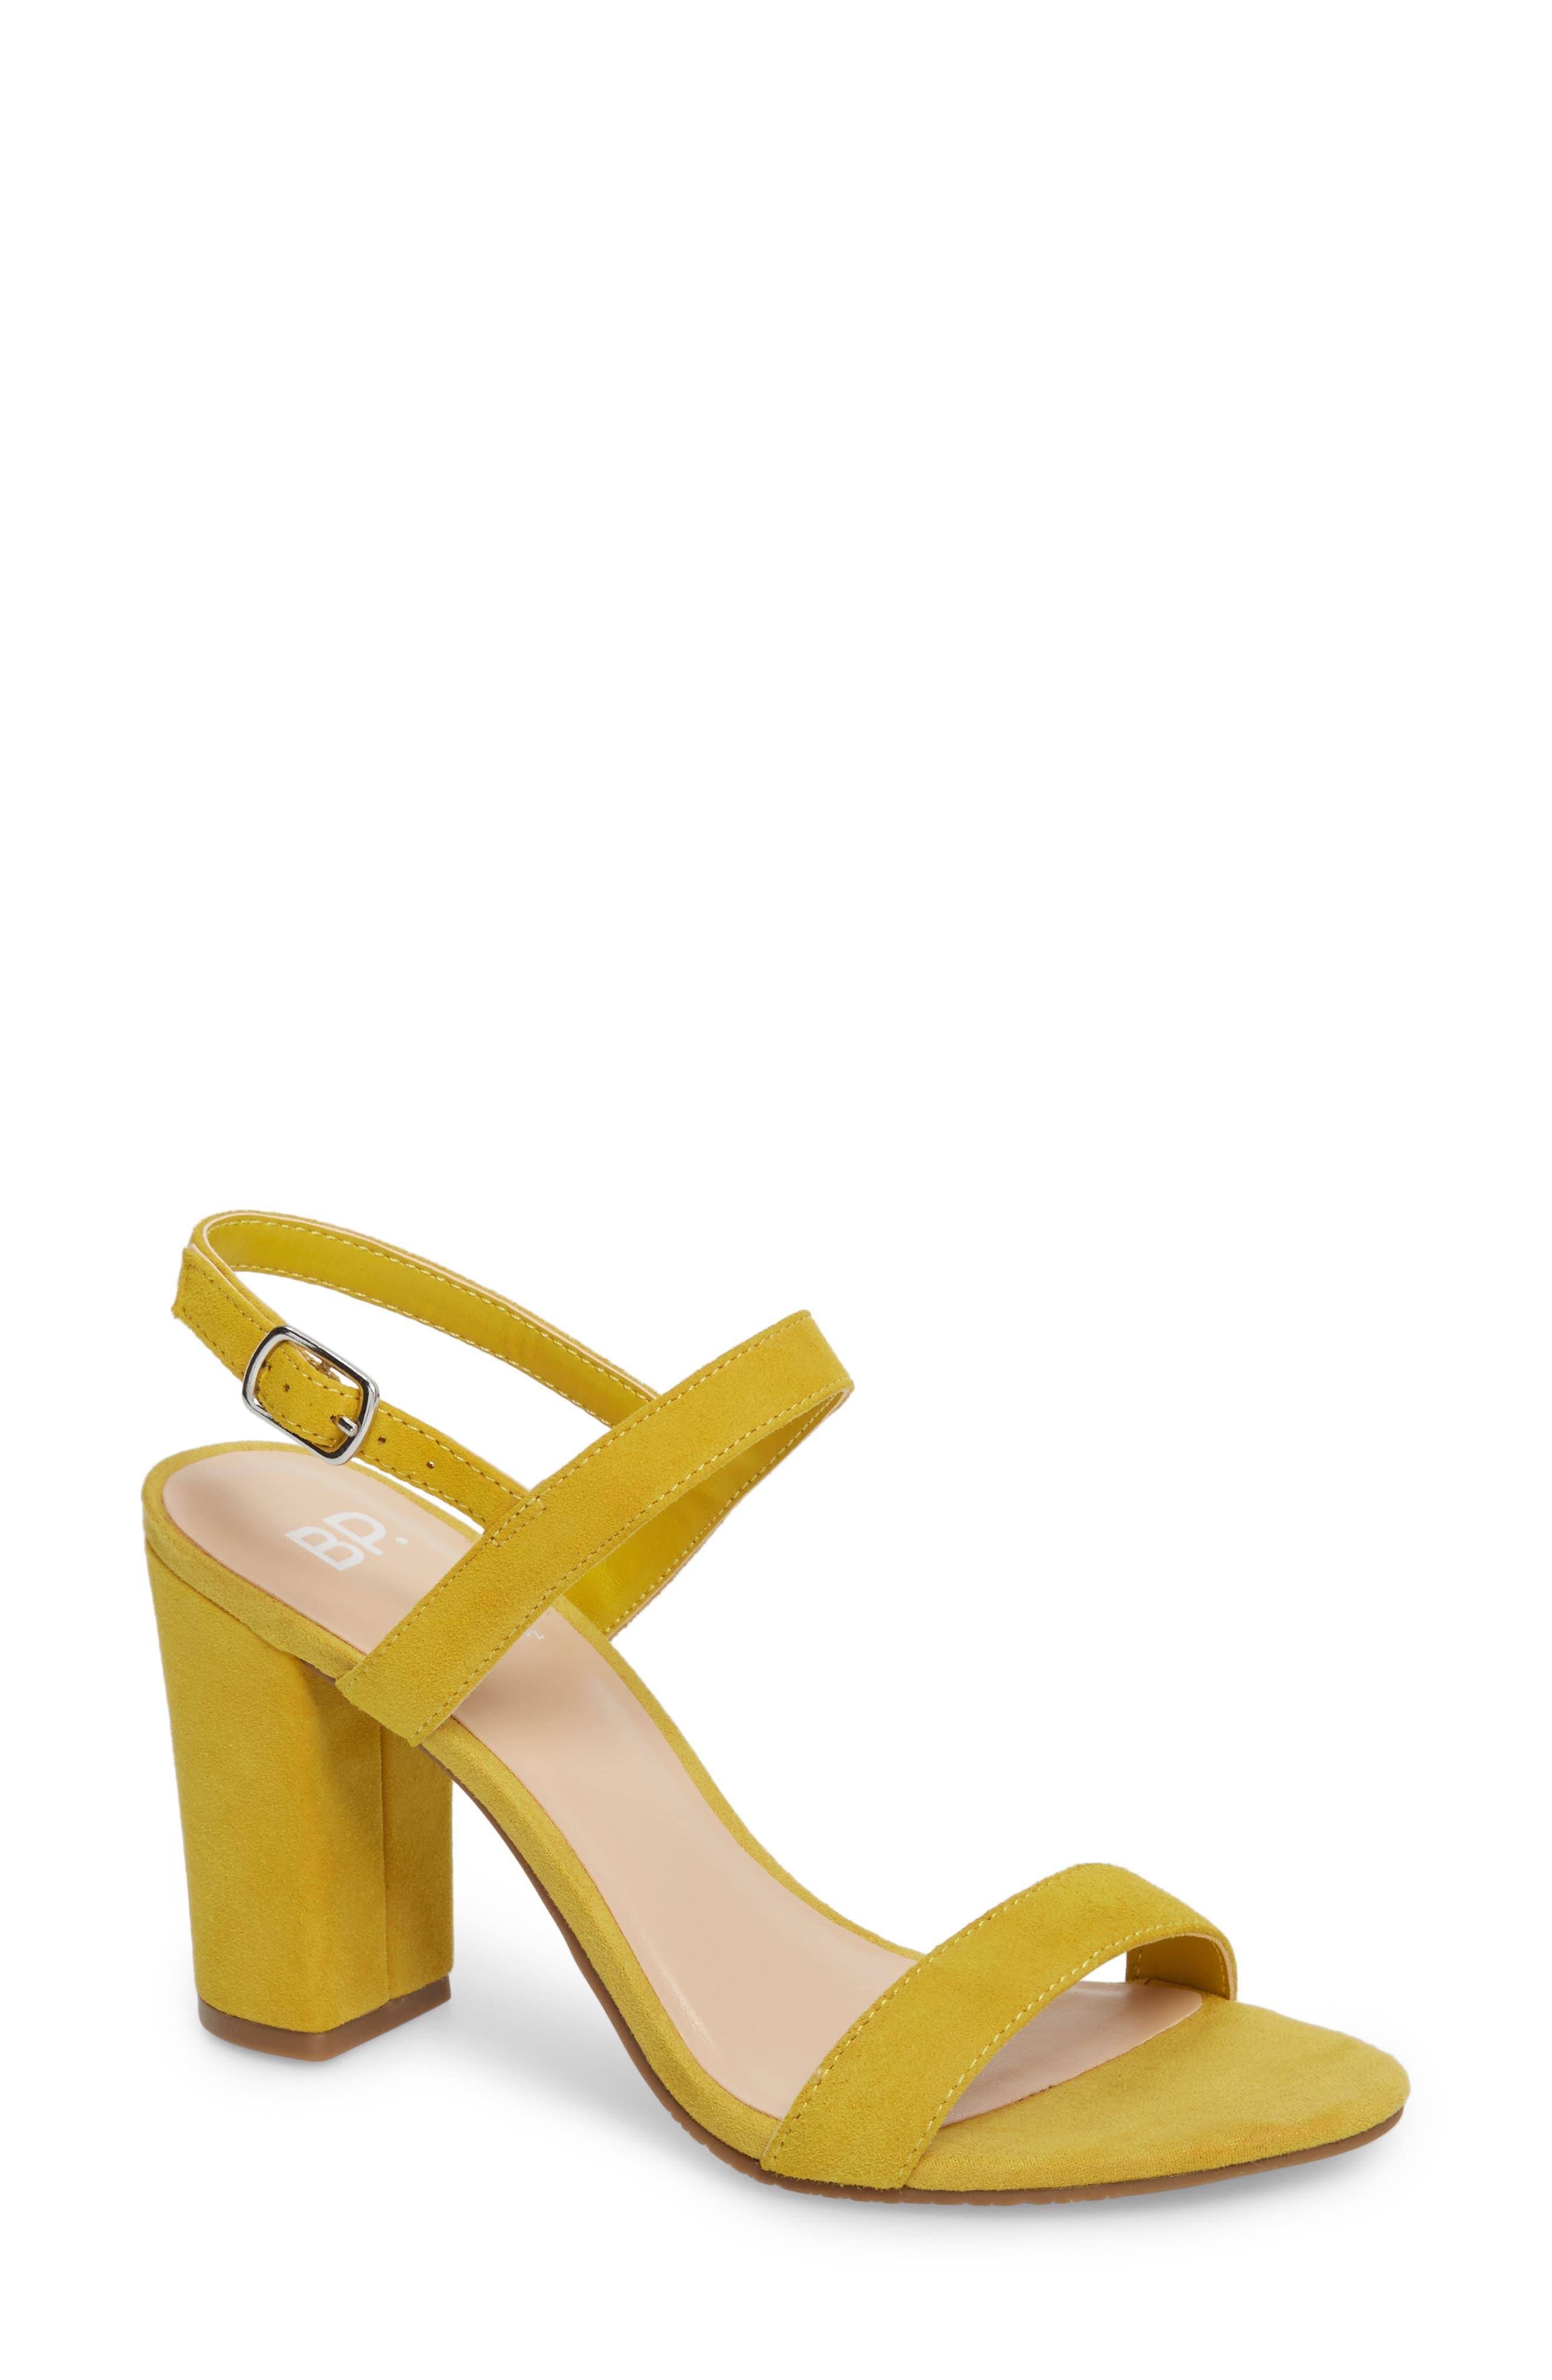 Lula Block Heel Slingback Sandal,                         Main,                         color, Yellow Suede